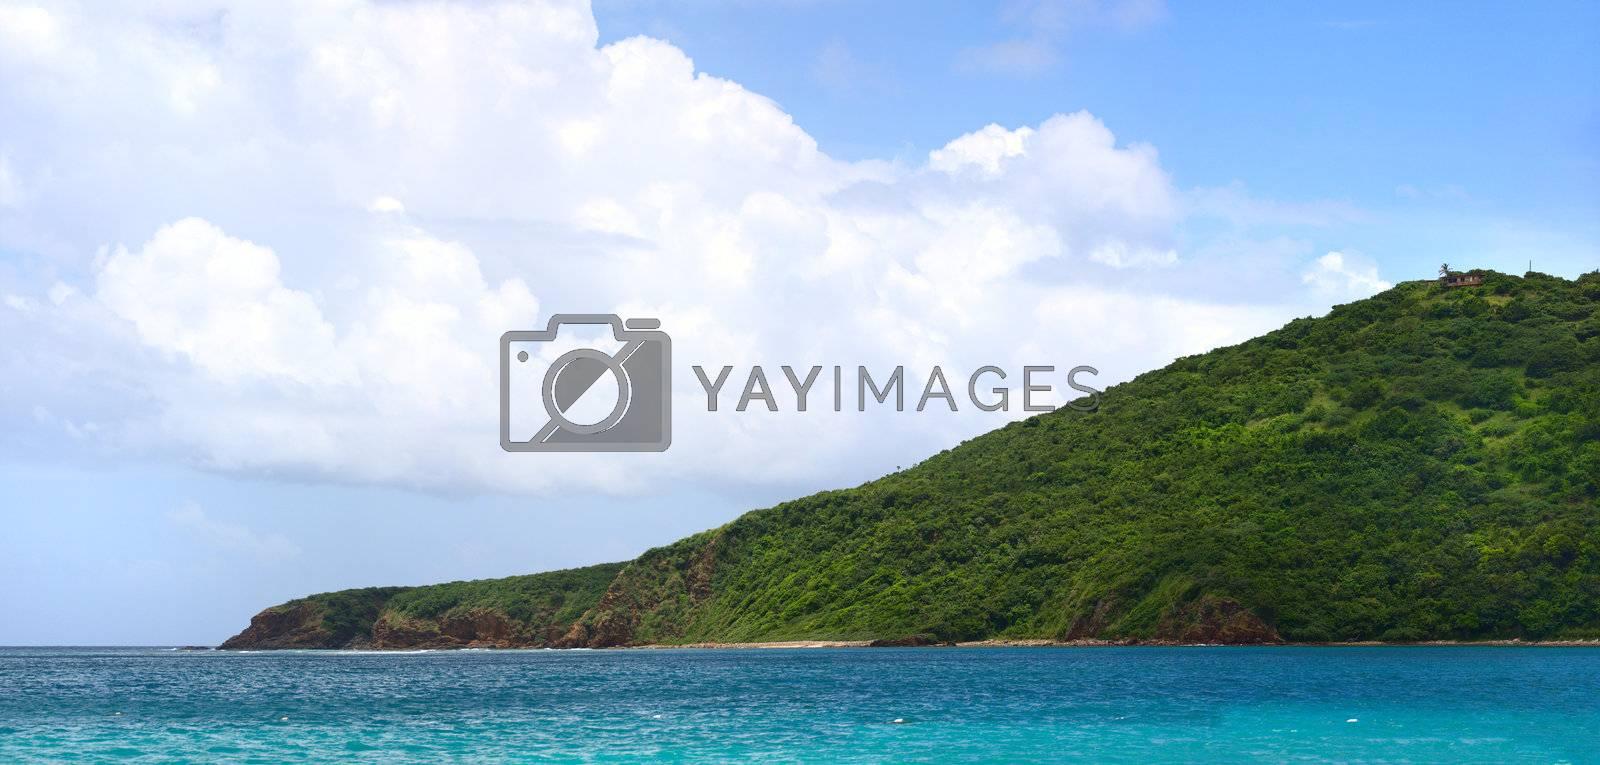 The far eastern shore across from Flamenco beach on the beautiful Puerto Rican island of Culebra.